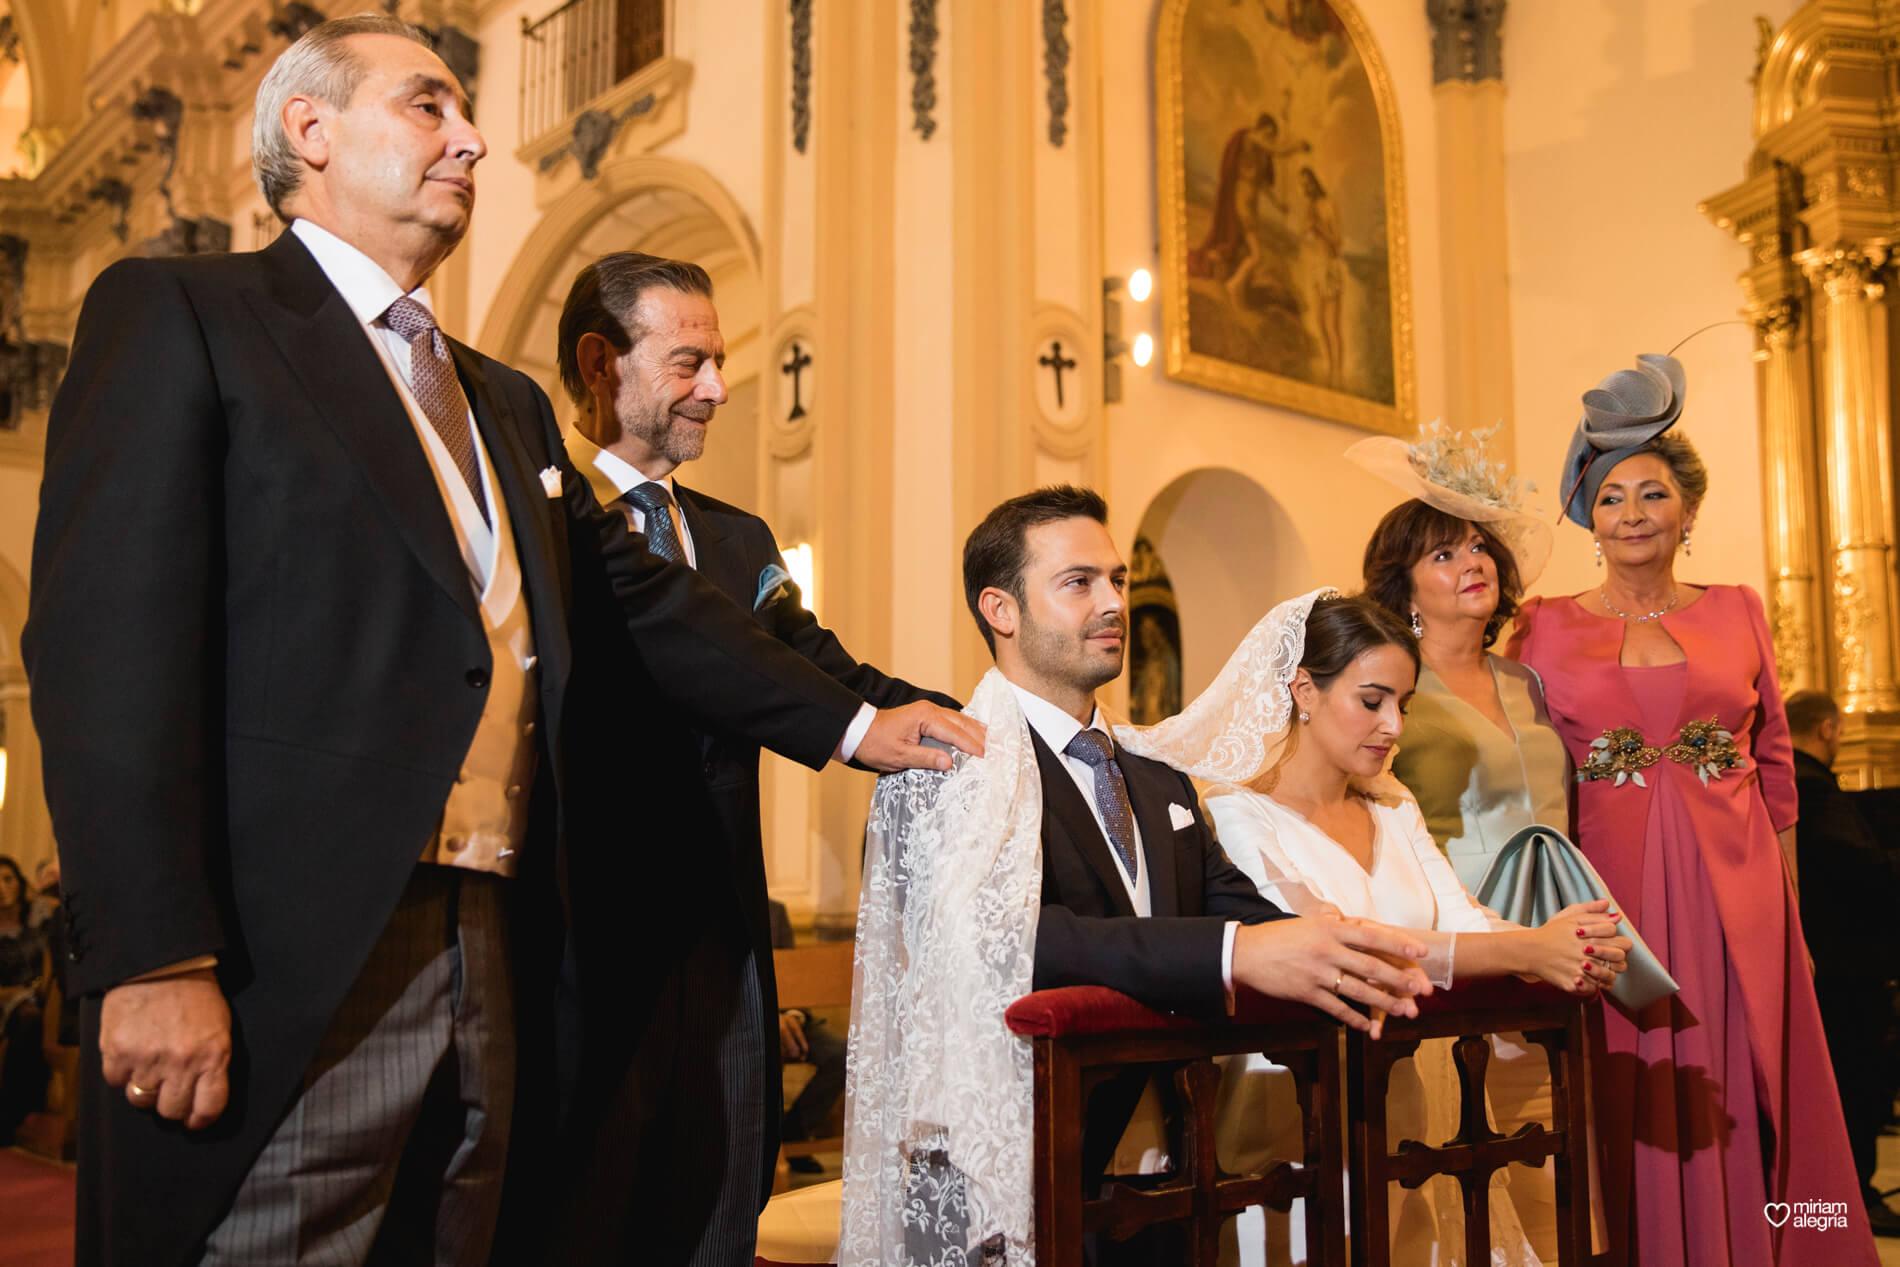 vestido-de-novia-paula-del-vas-miriam-alegria-fotografos-boda-murcia-62